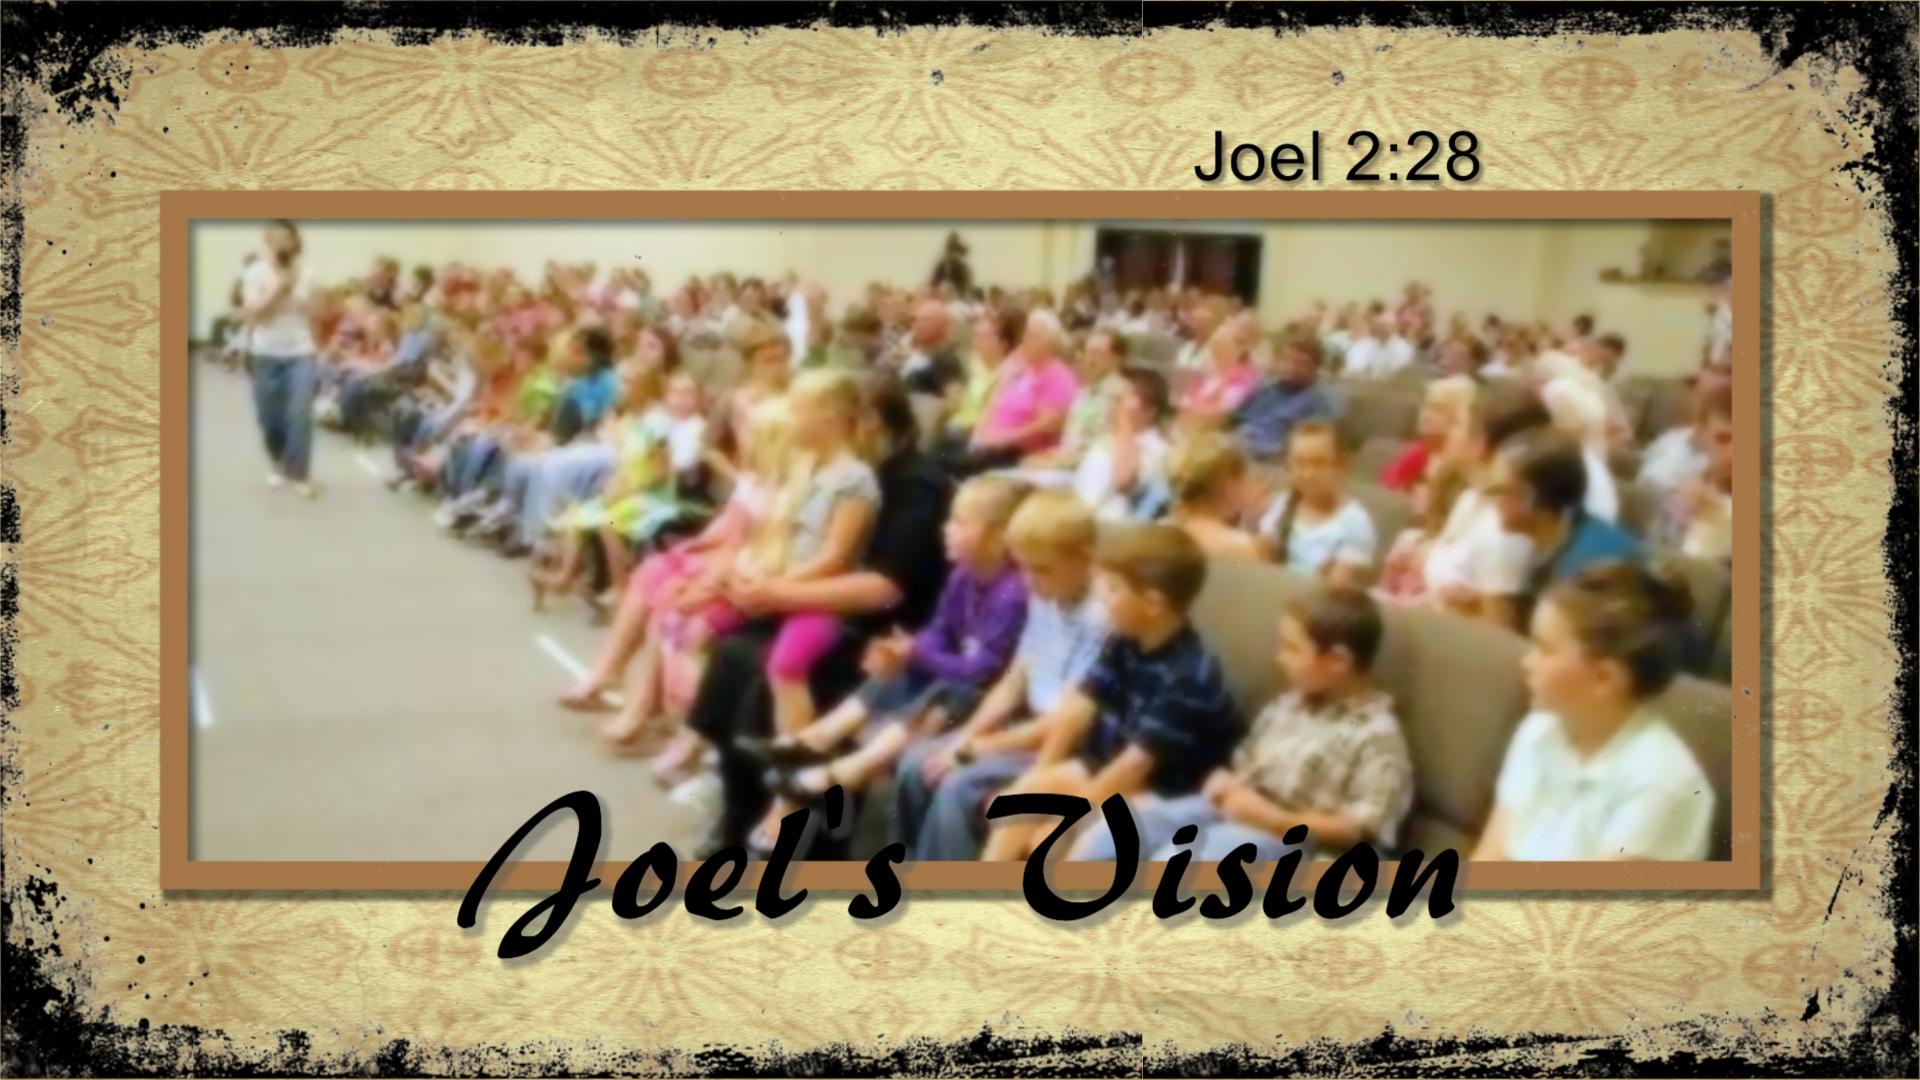 Joel's Vision Logo 2 pic